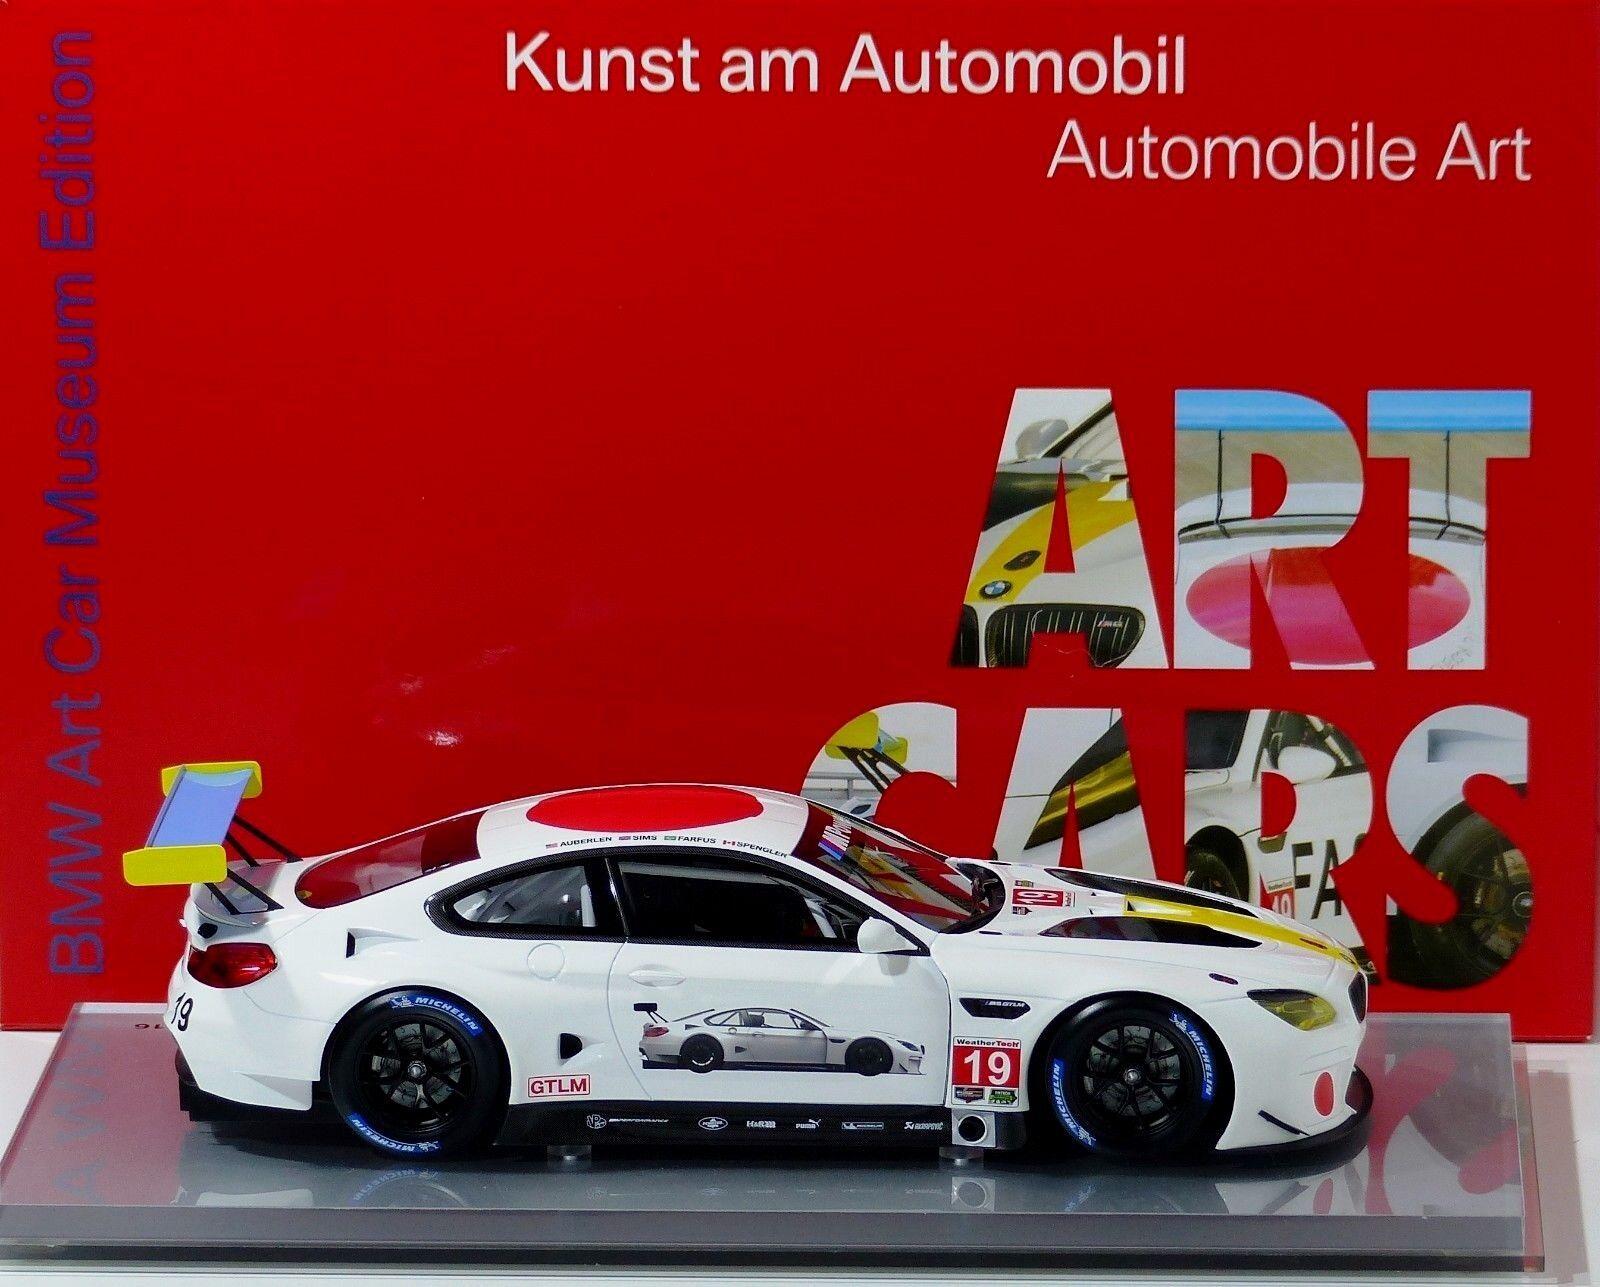 BMW ART CAR m6 GTLM John Baldessari Baldessari Baldessari  19 24 H DAYTONA BMW M-Power Kyosho 1 18 neuf 7efd9e